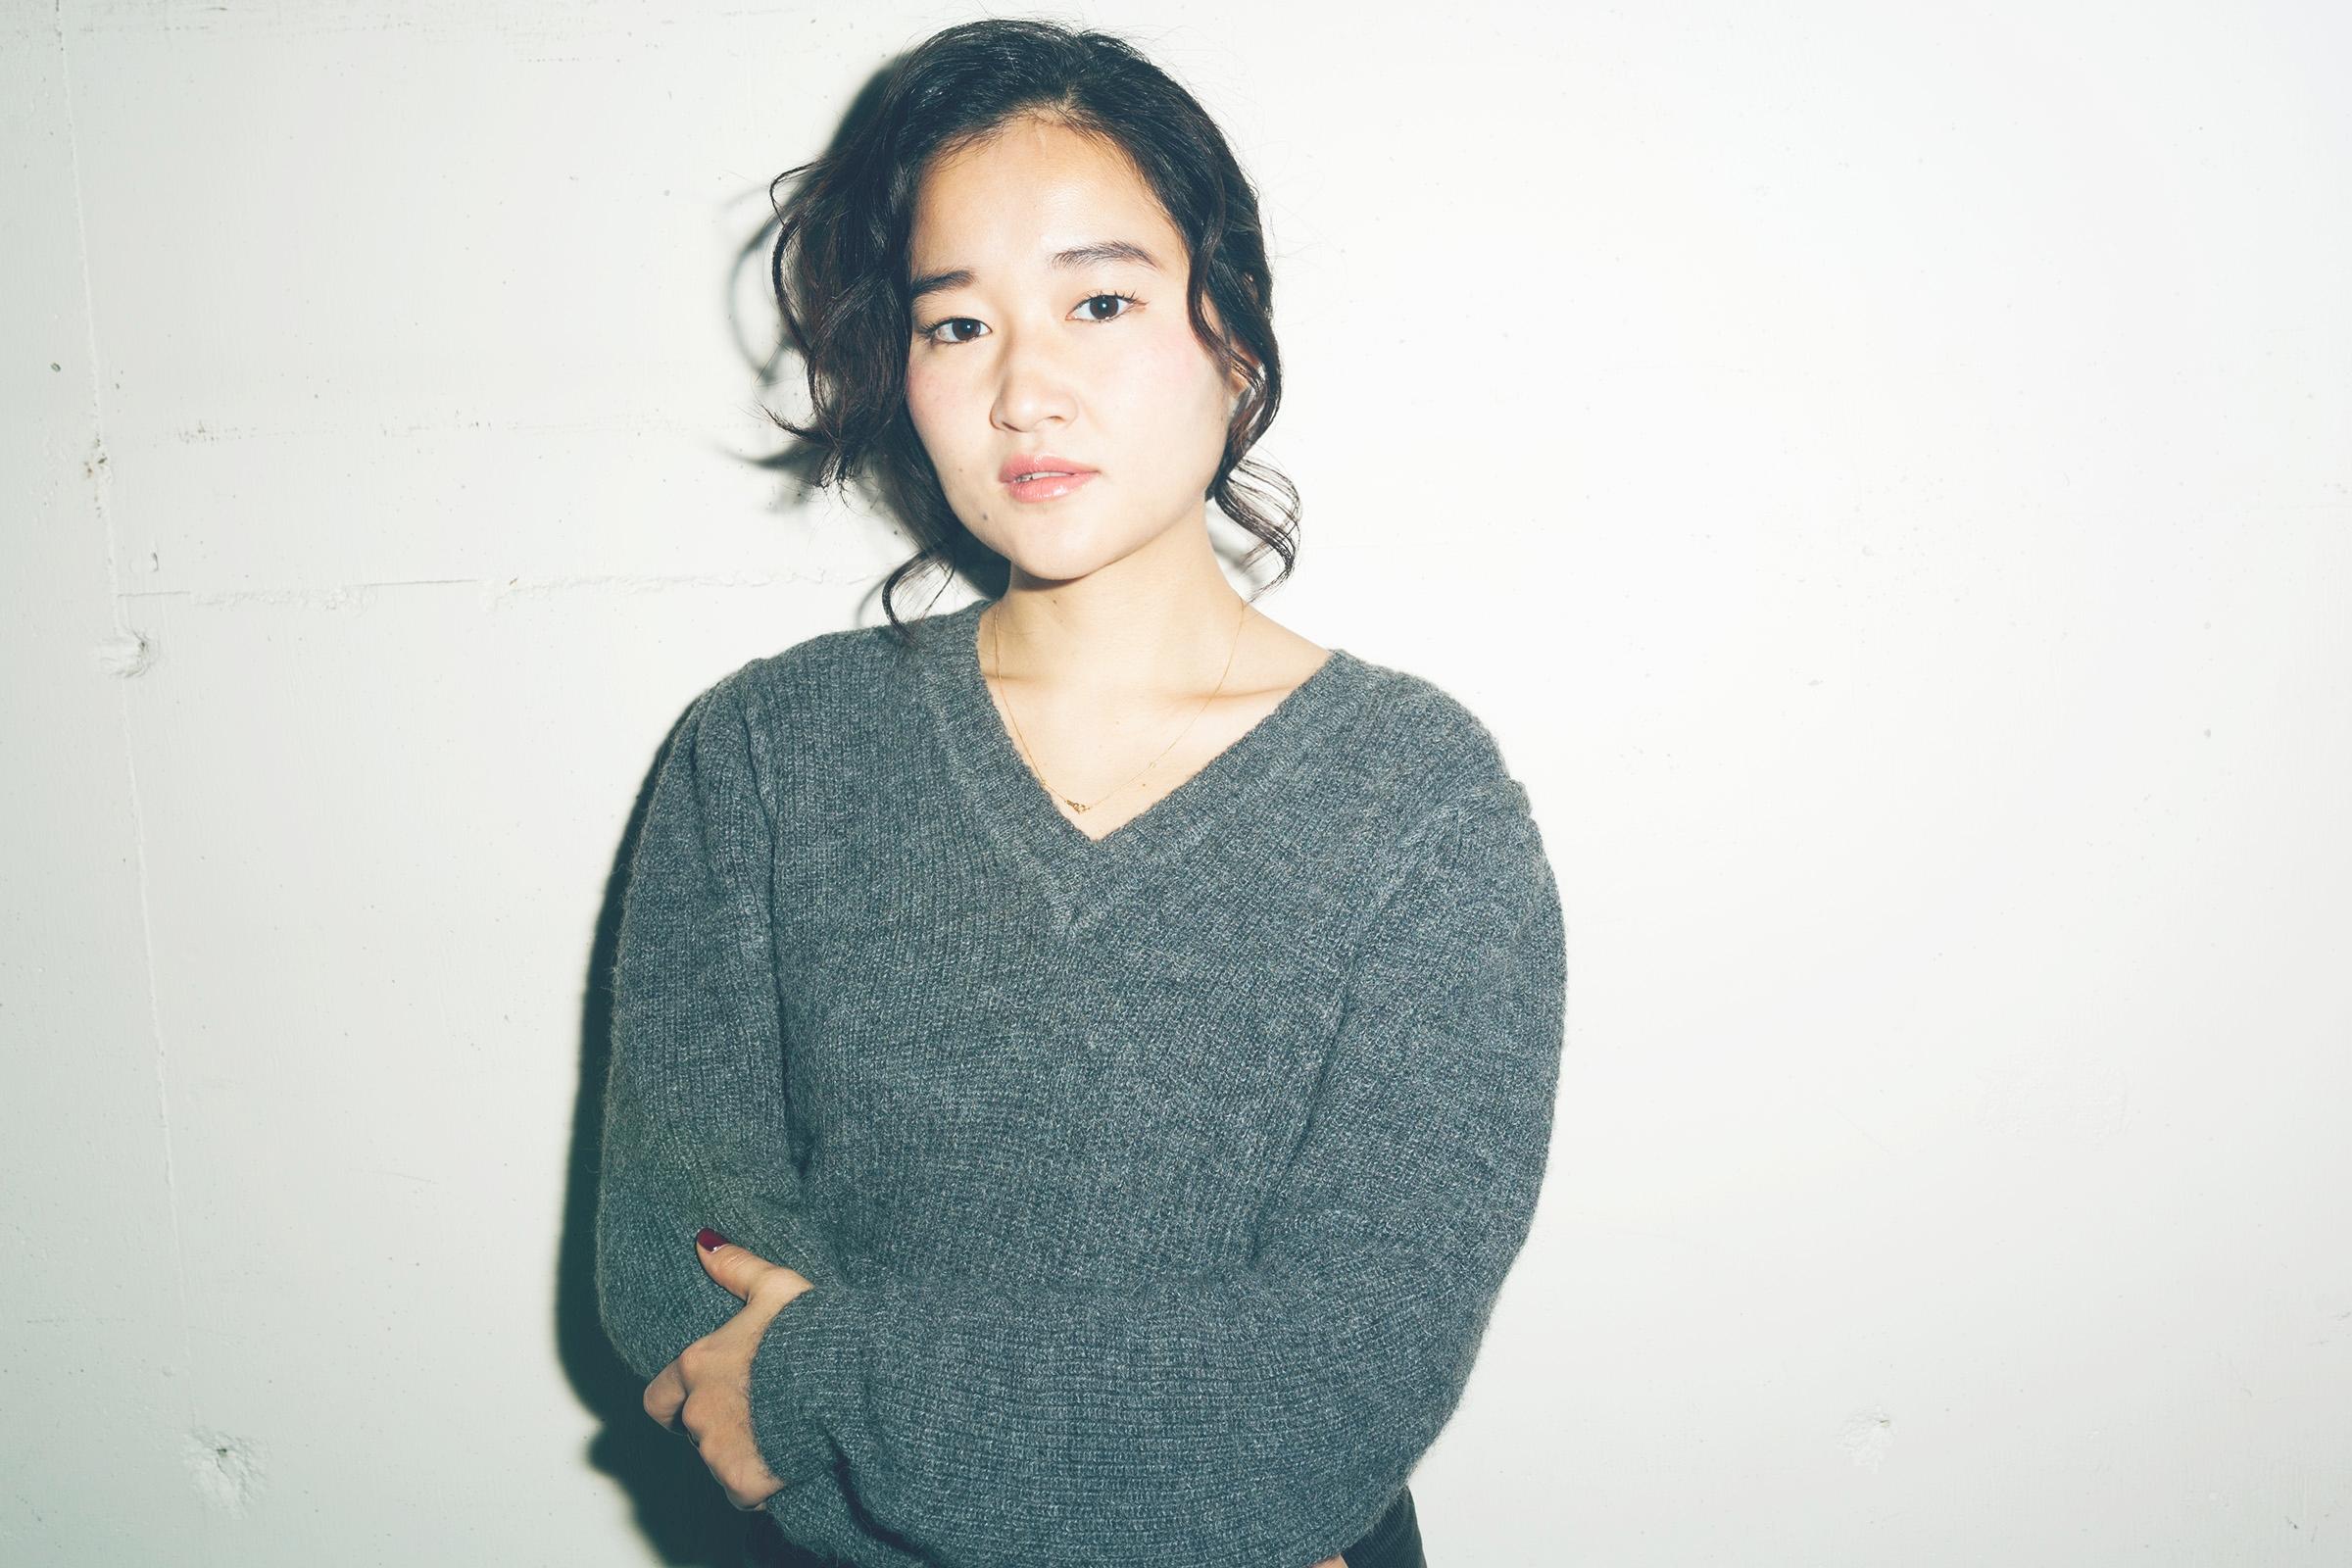 Ai Nakayama   Stylist  東京都出身。日本美容専門学校卒業。都内1店舗を経て2007年Savaに参加。サロンワーク、着物の着付けなどで活動する。